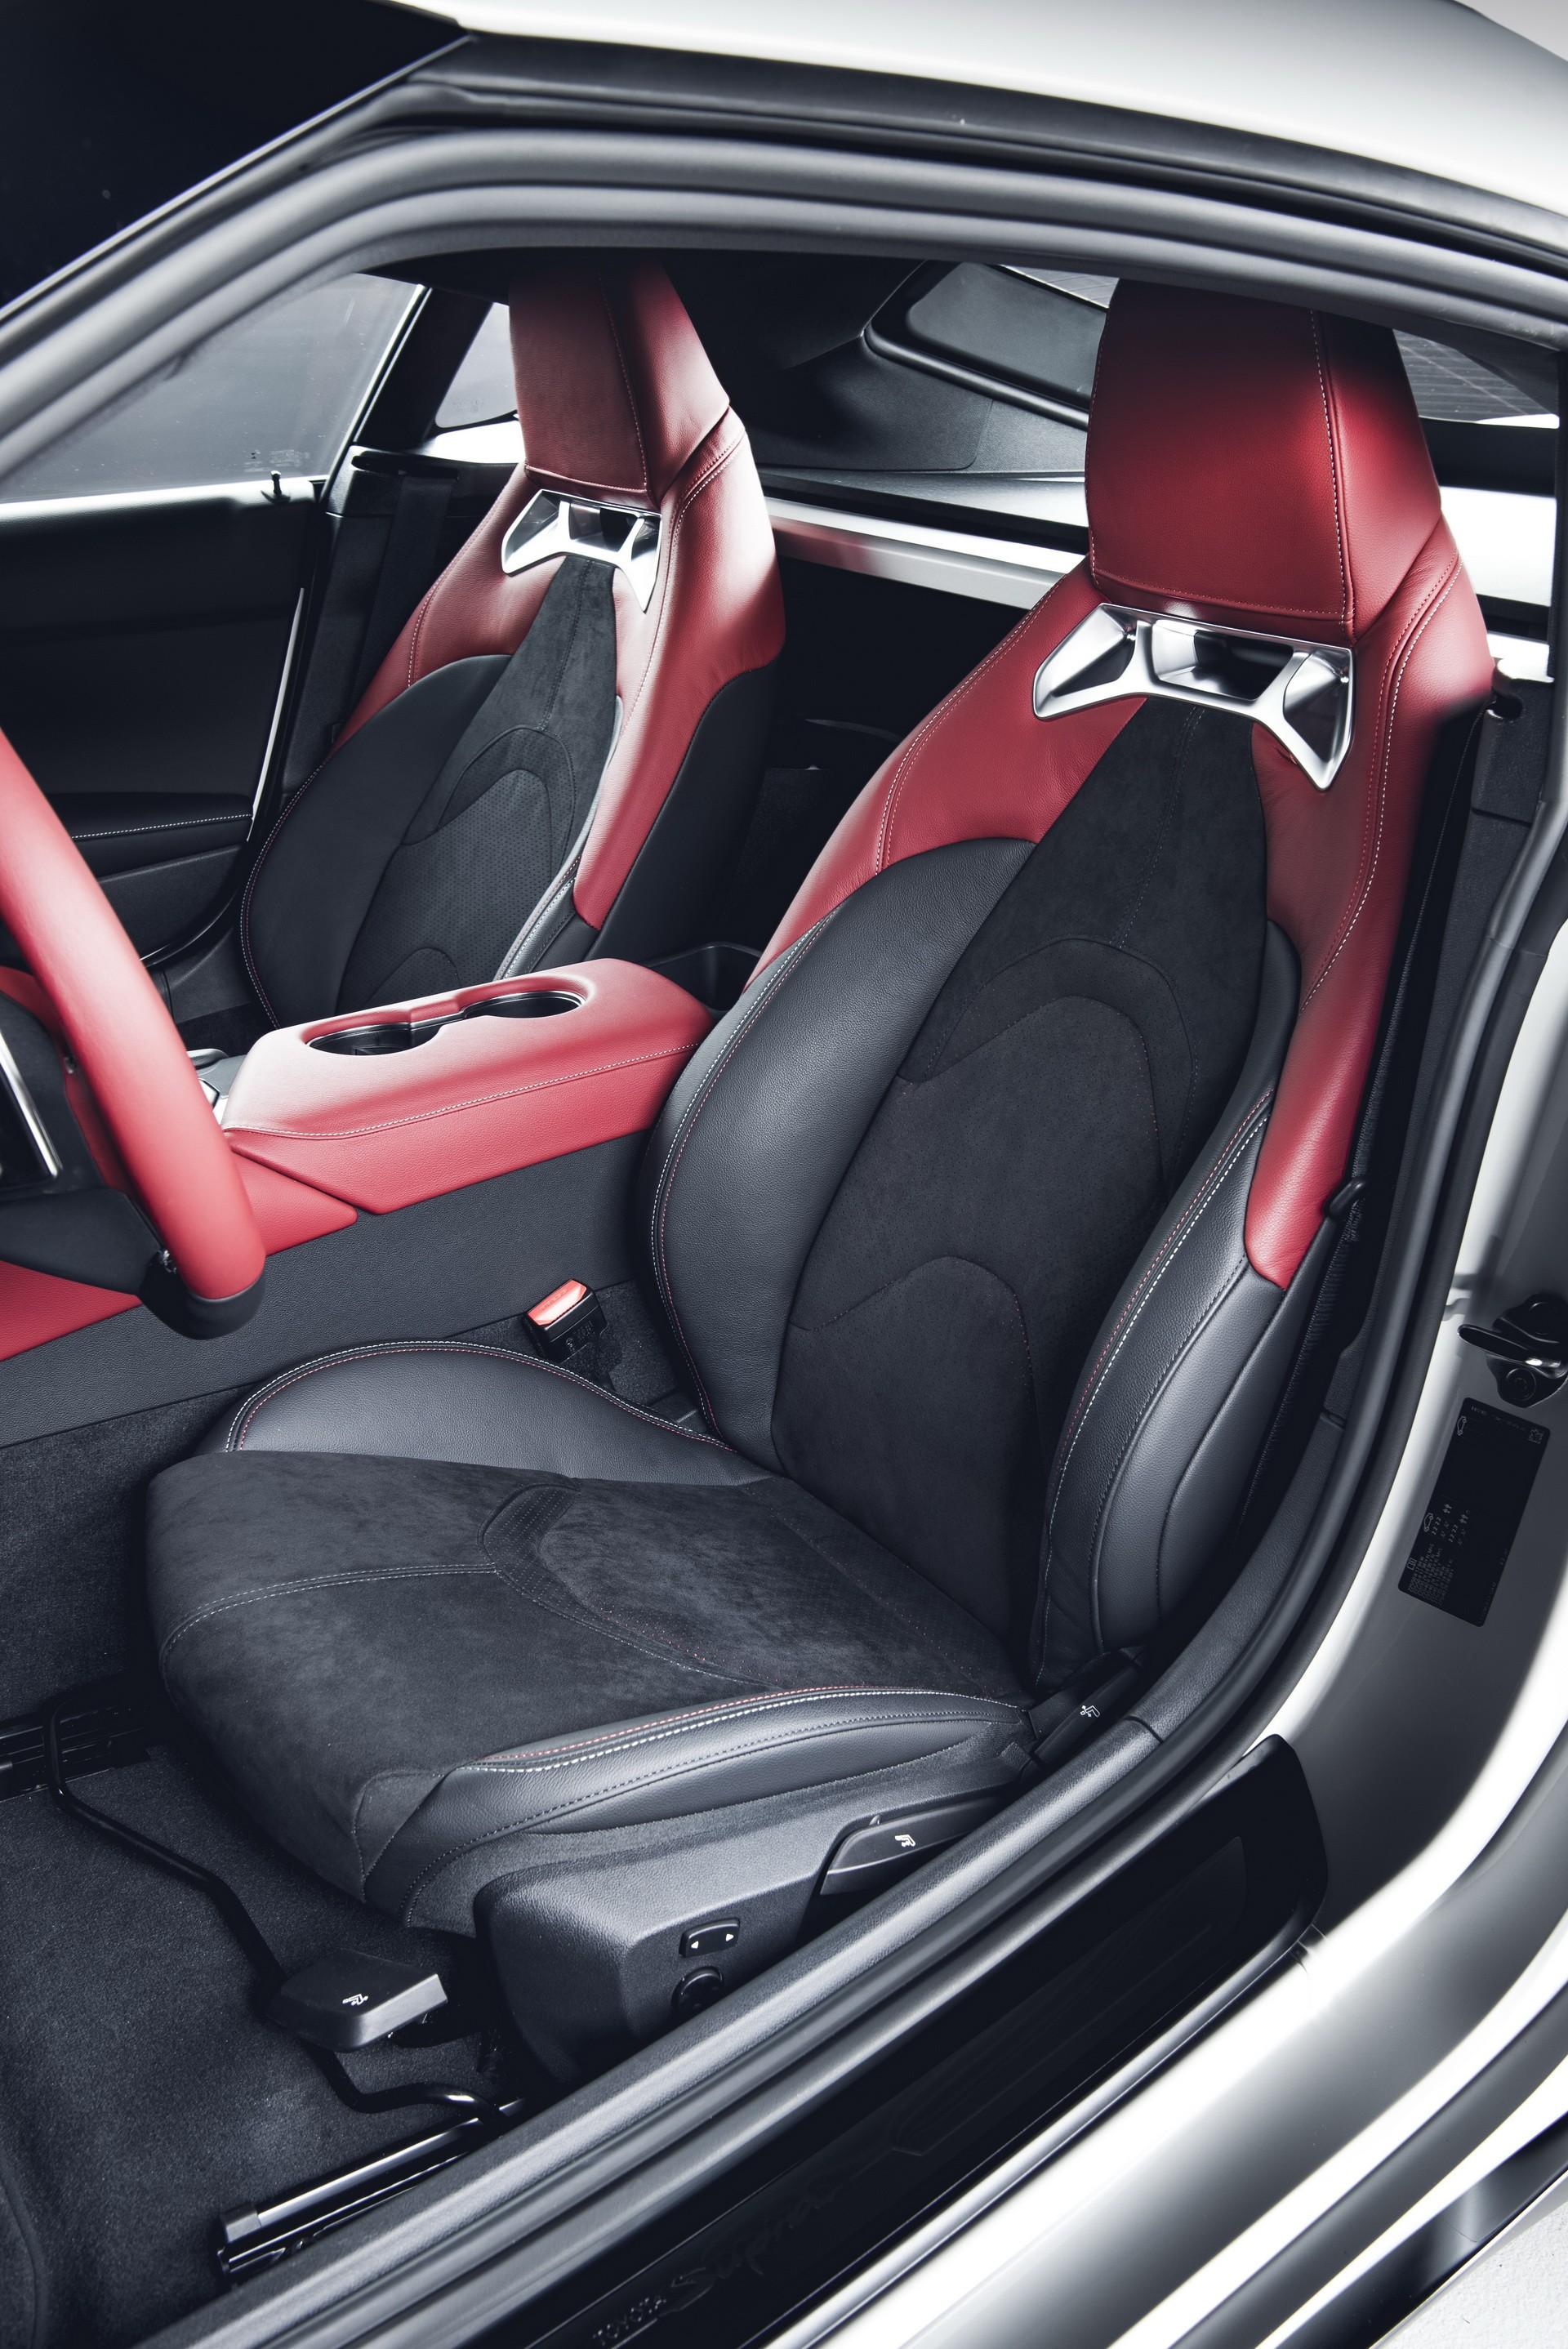 Toyota GR Supra (A90) 2020 36